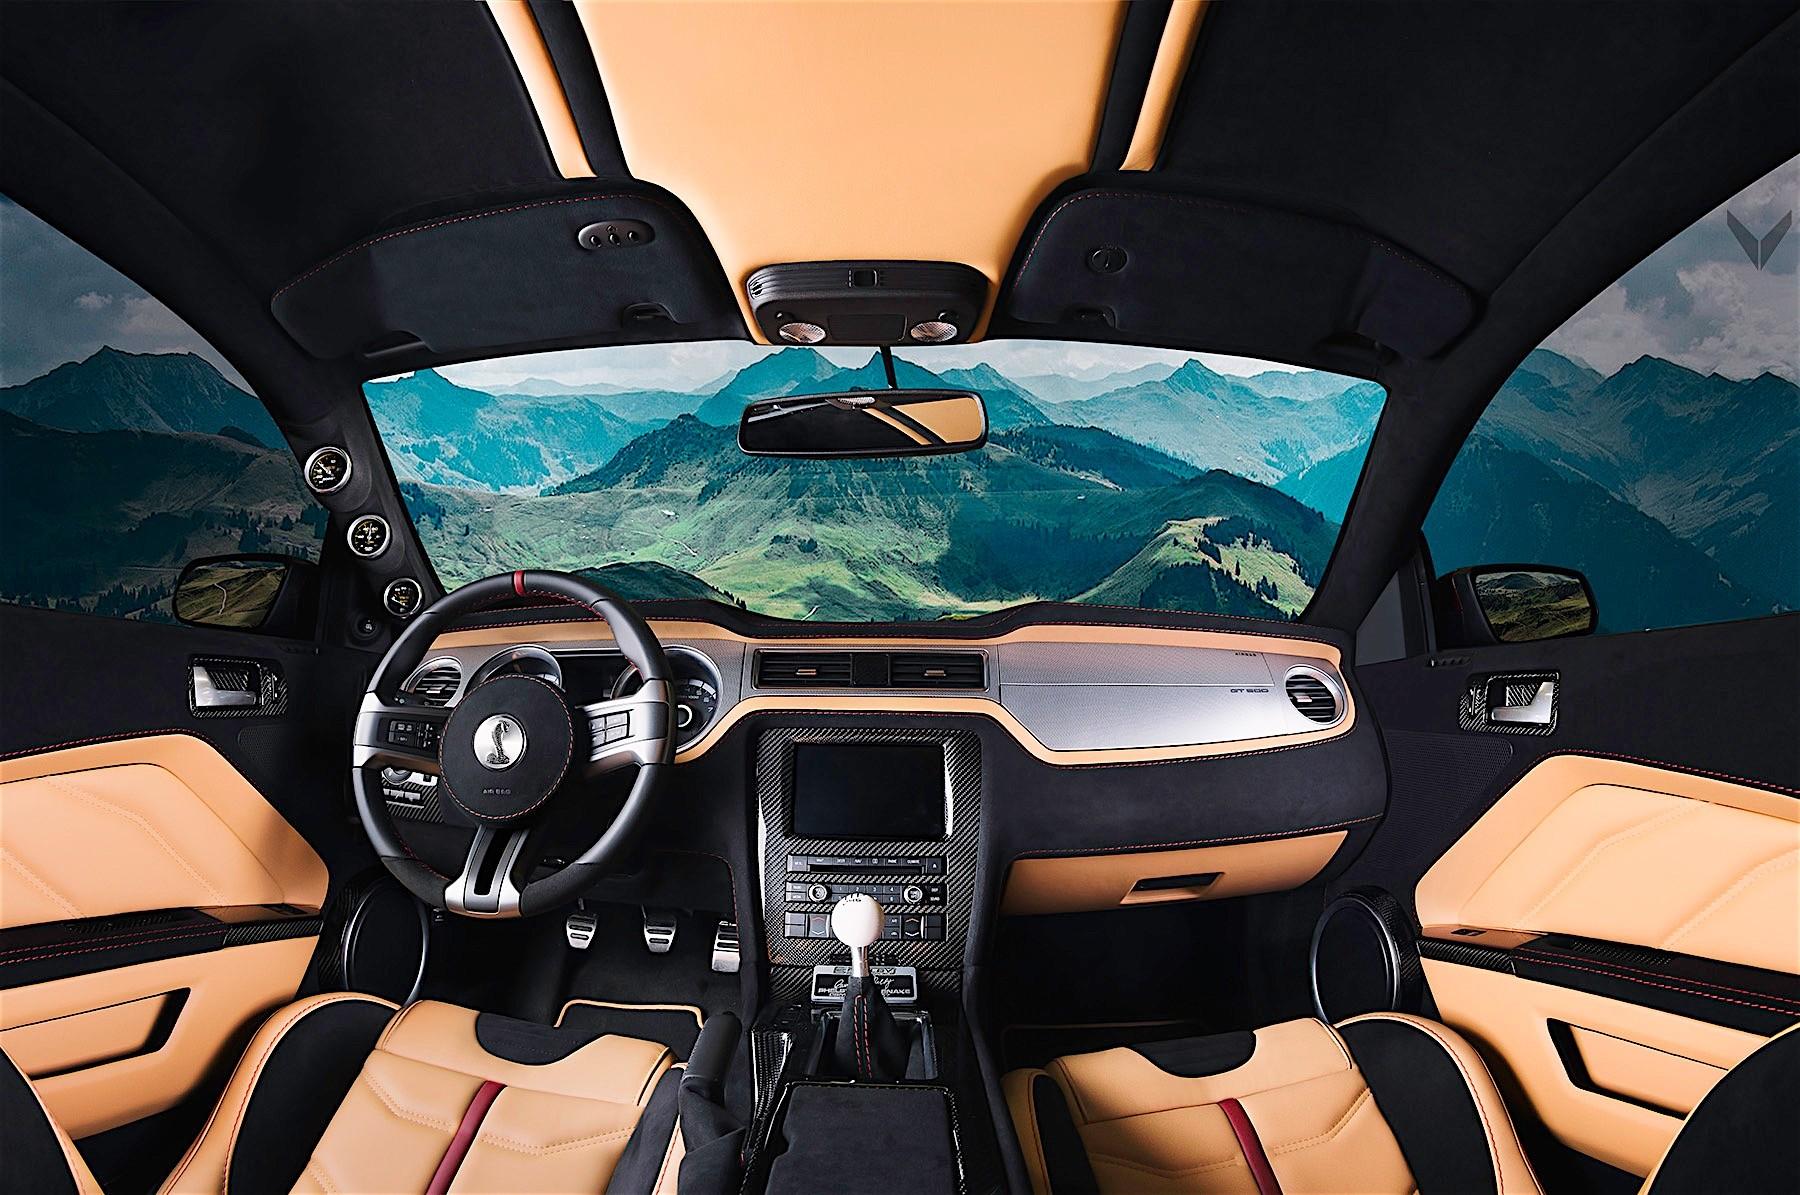 Watch a Classic Mustang Being Reborn in the High Tech Era ...